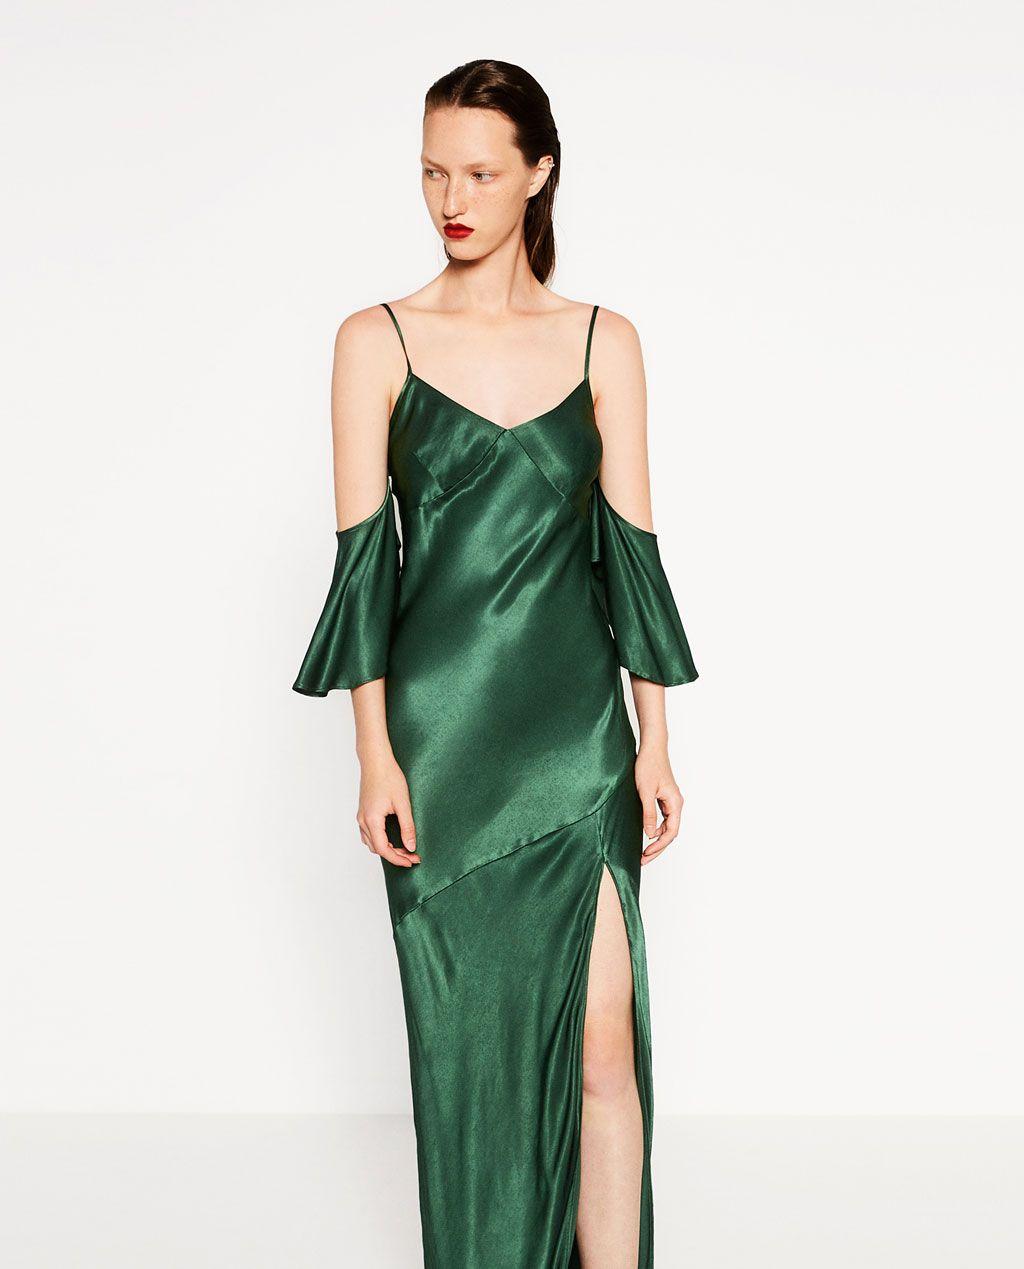 DRESSES-WOMAN | ZARA United States - STRAPPY FRILLED DRESS.-DRESSES-WOMAN ZARA United States